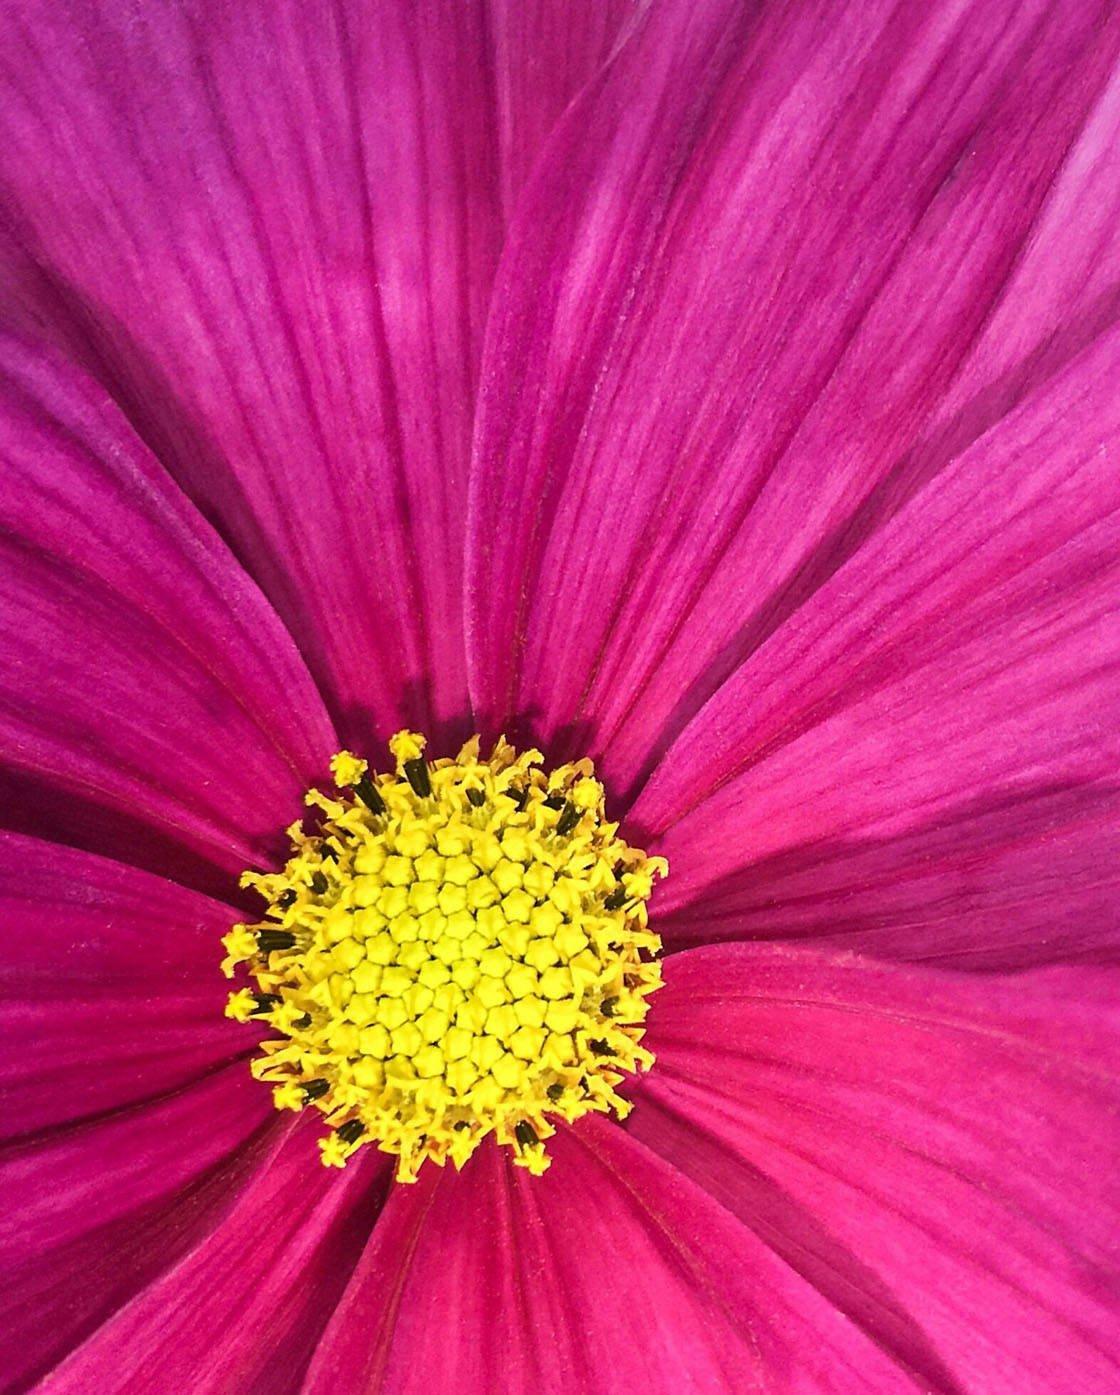 Closeup Macro iPhone Photos 9 no script